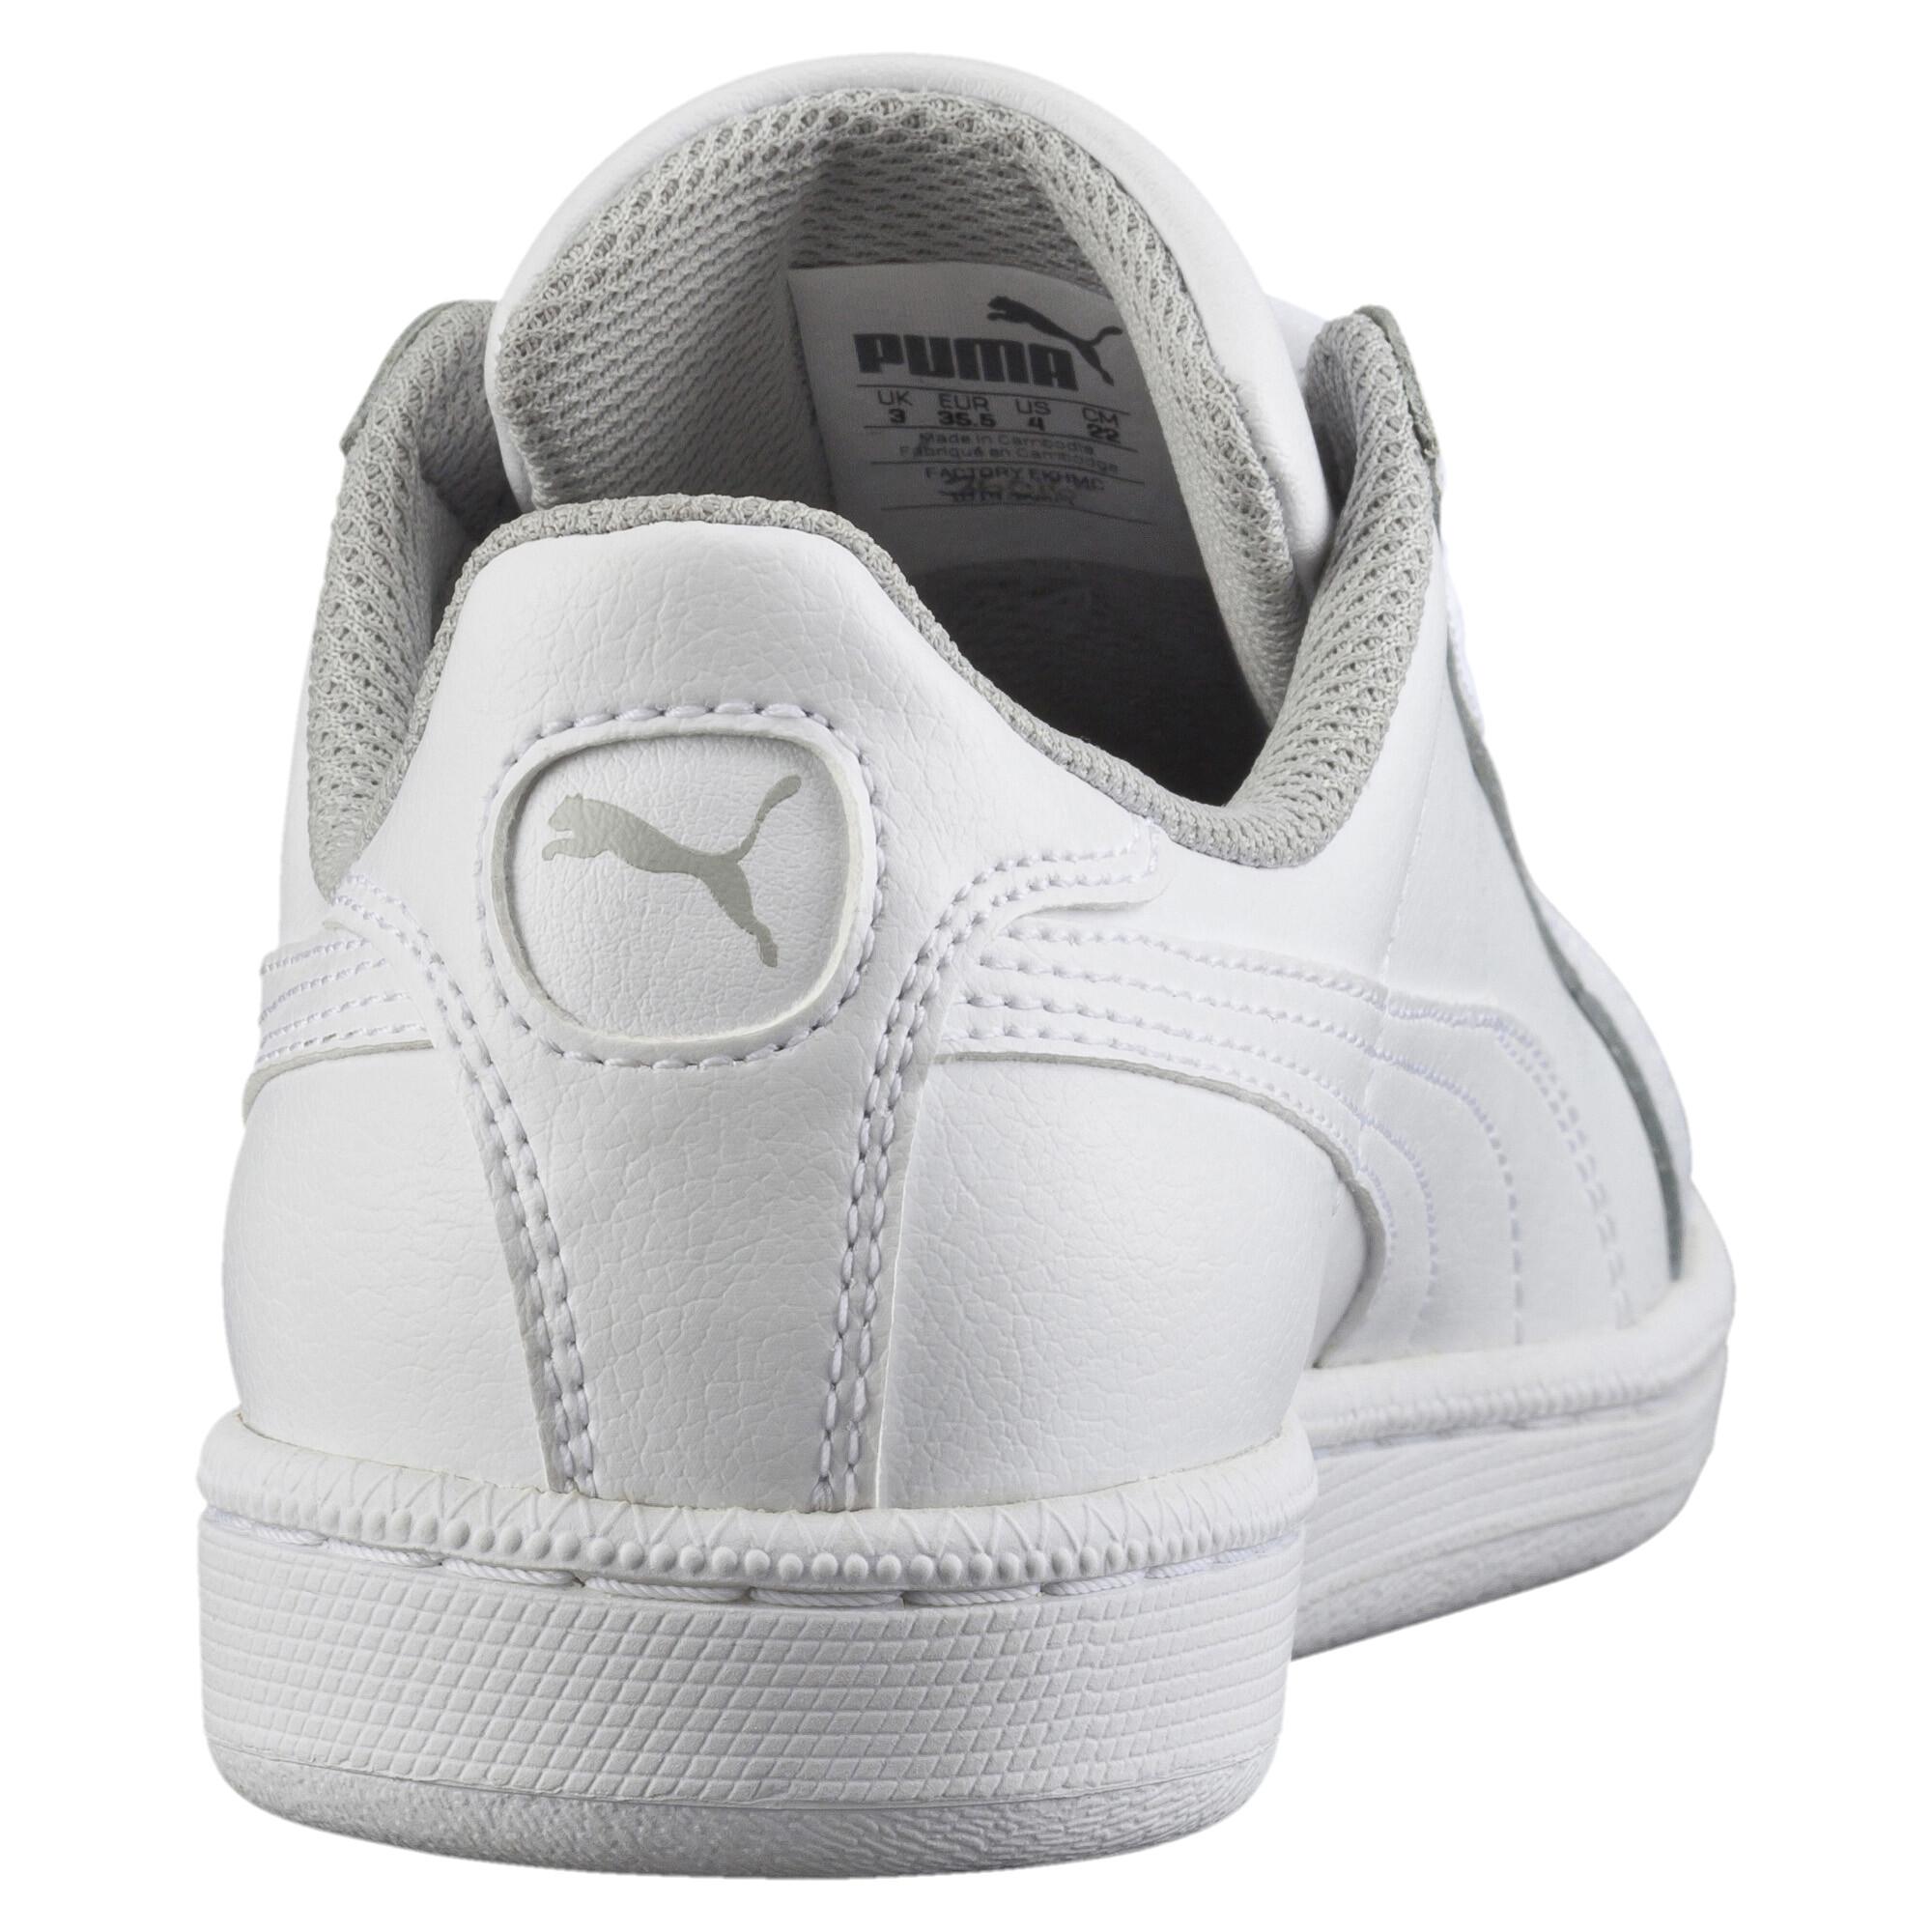 PUMA-Smash-Jr-Sneaker-Unisex-Schuhe-Kinder-Neu Indexbild 8